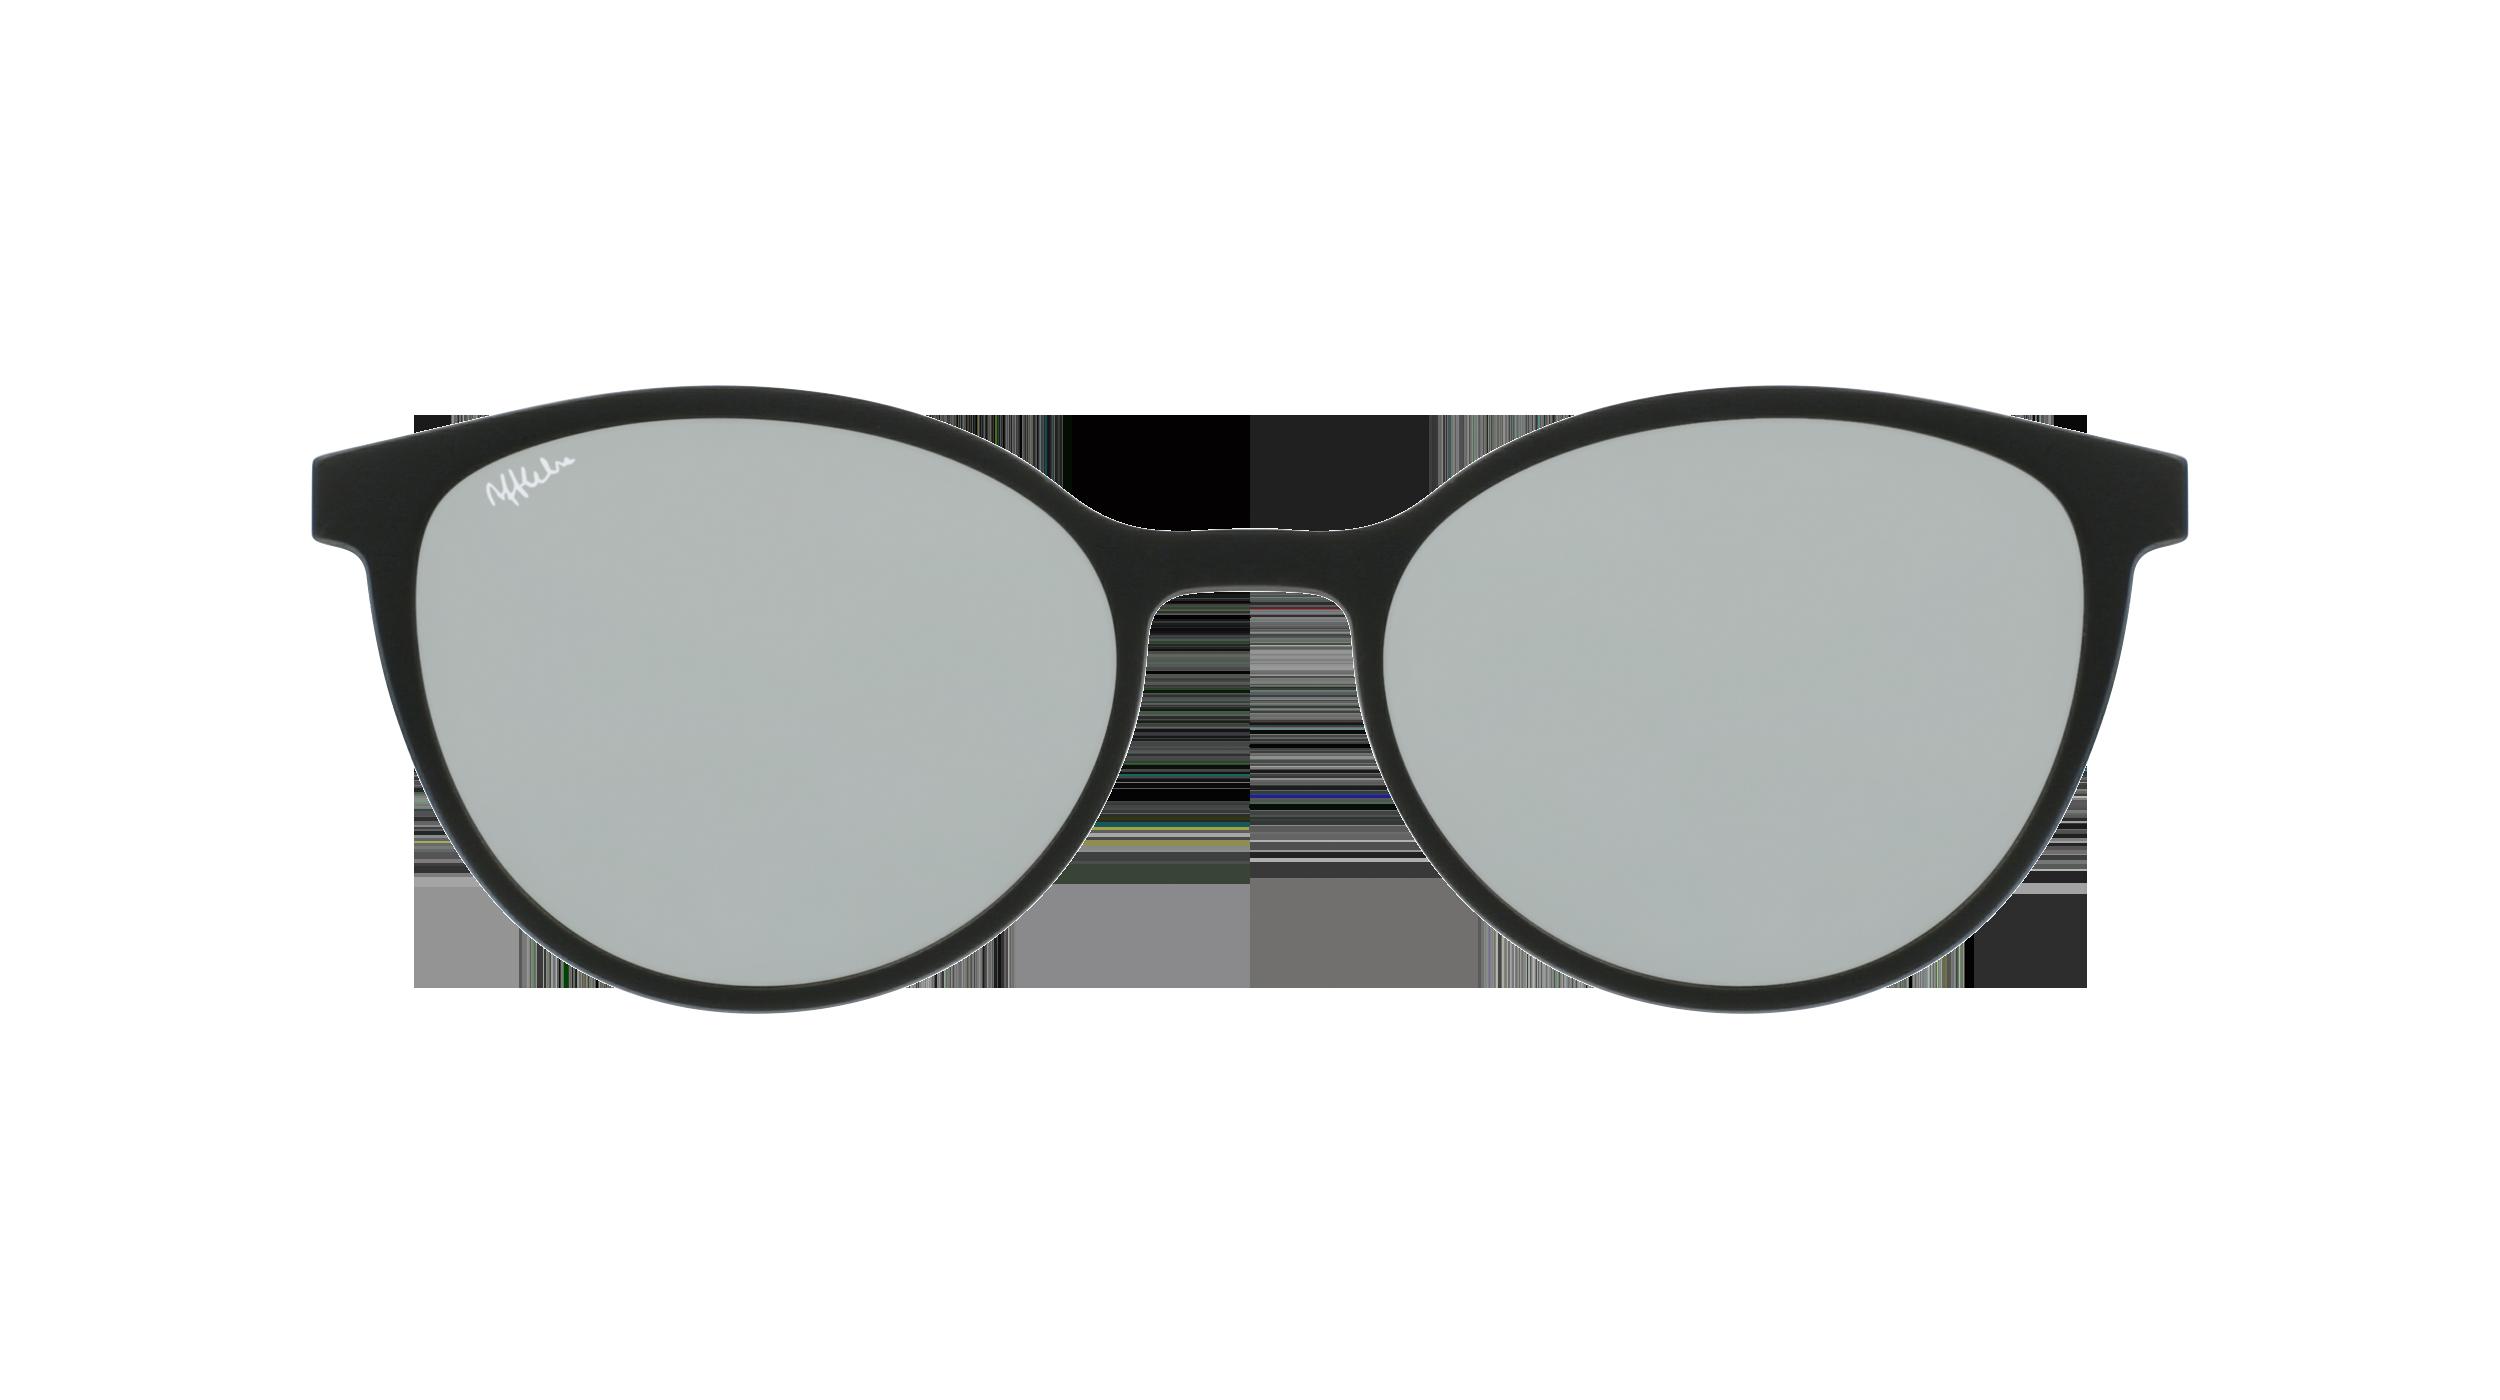 afflelou/france/products/smart_clip/clips_glasses/07630036458945.png